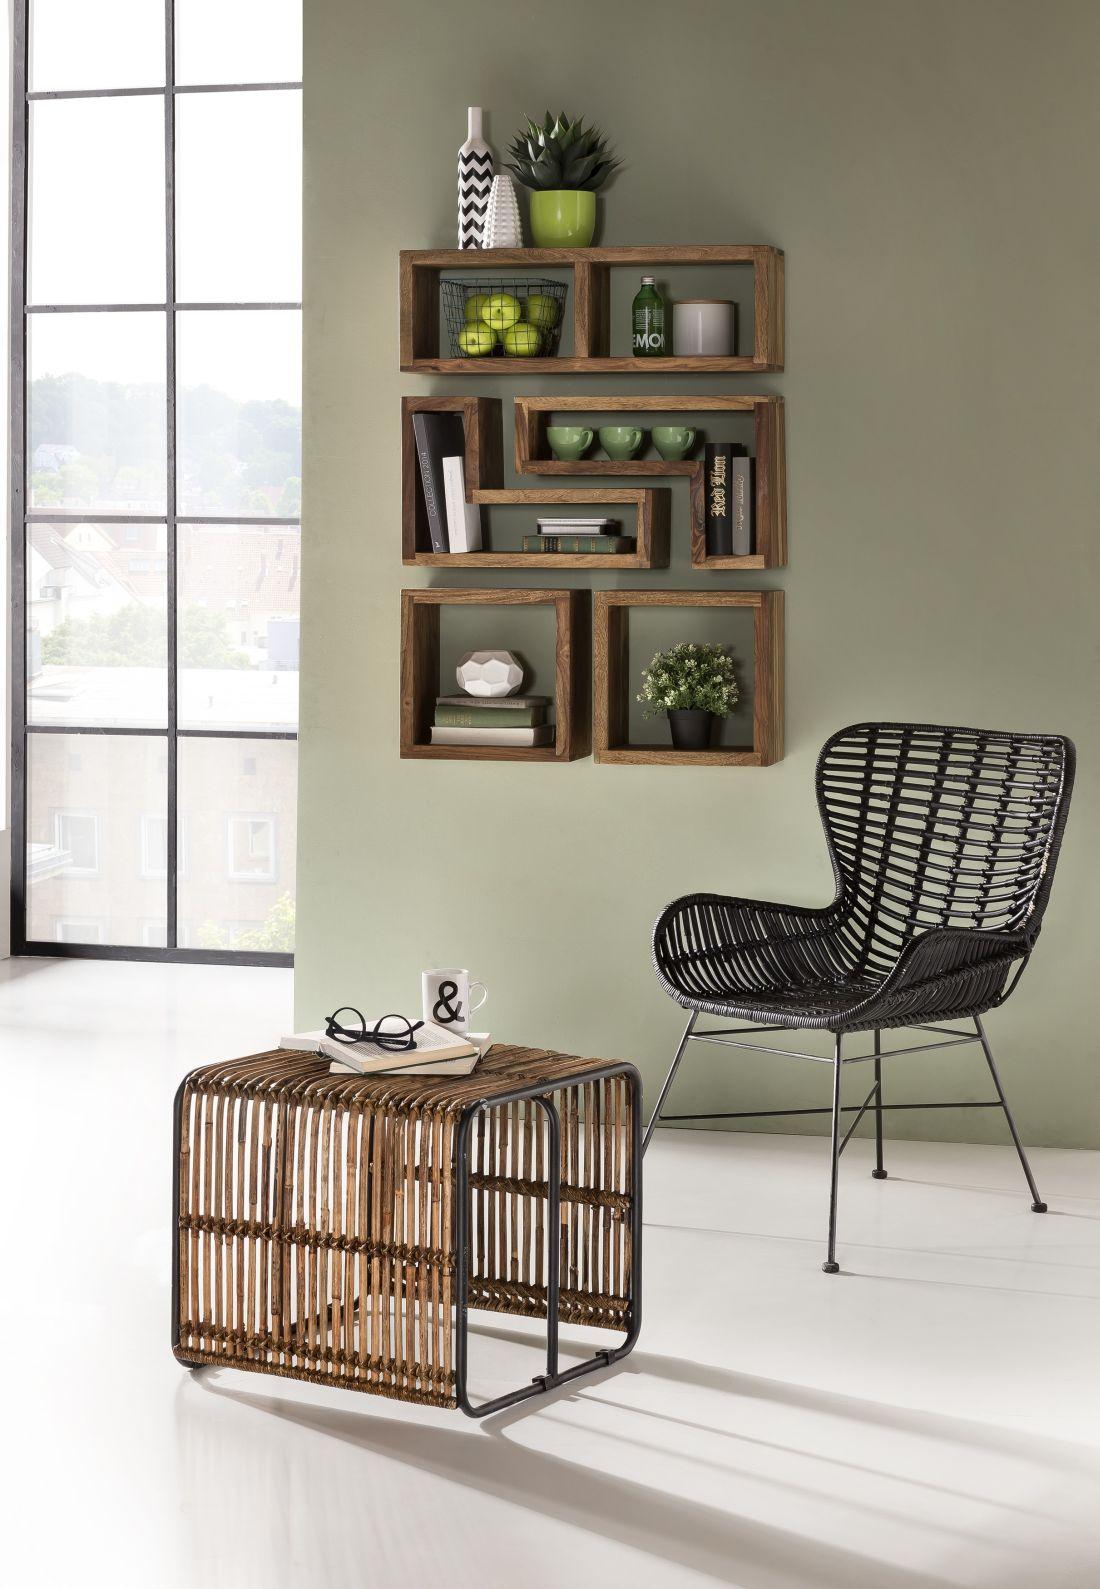 15smither-of-stamford_rattan-armchair.jpg